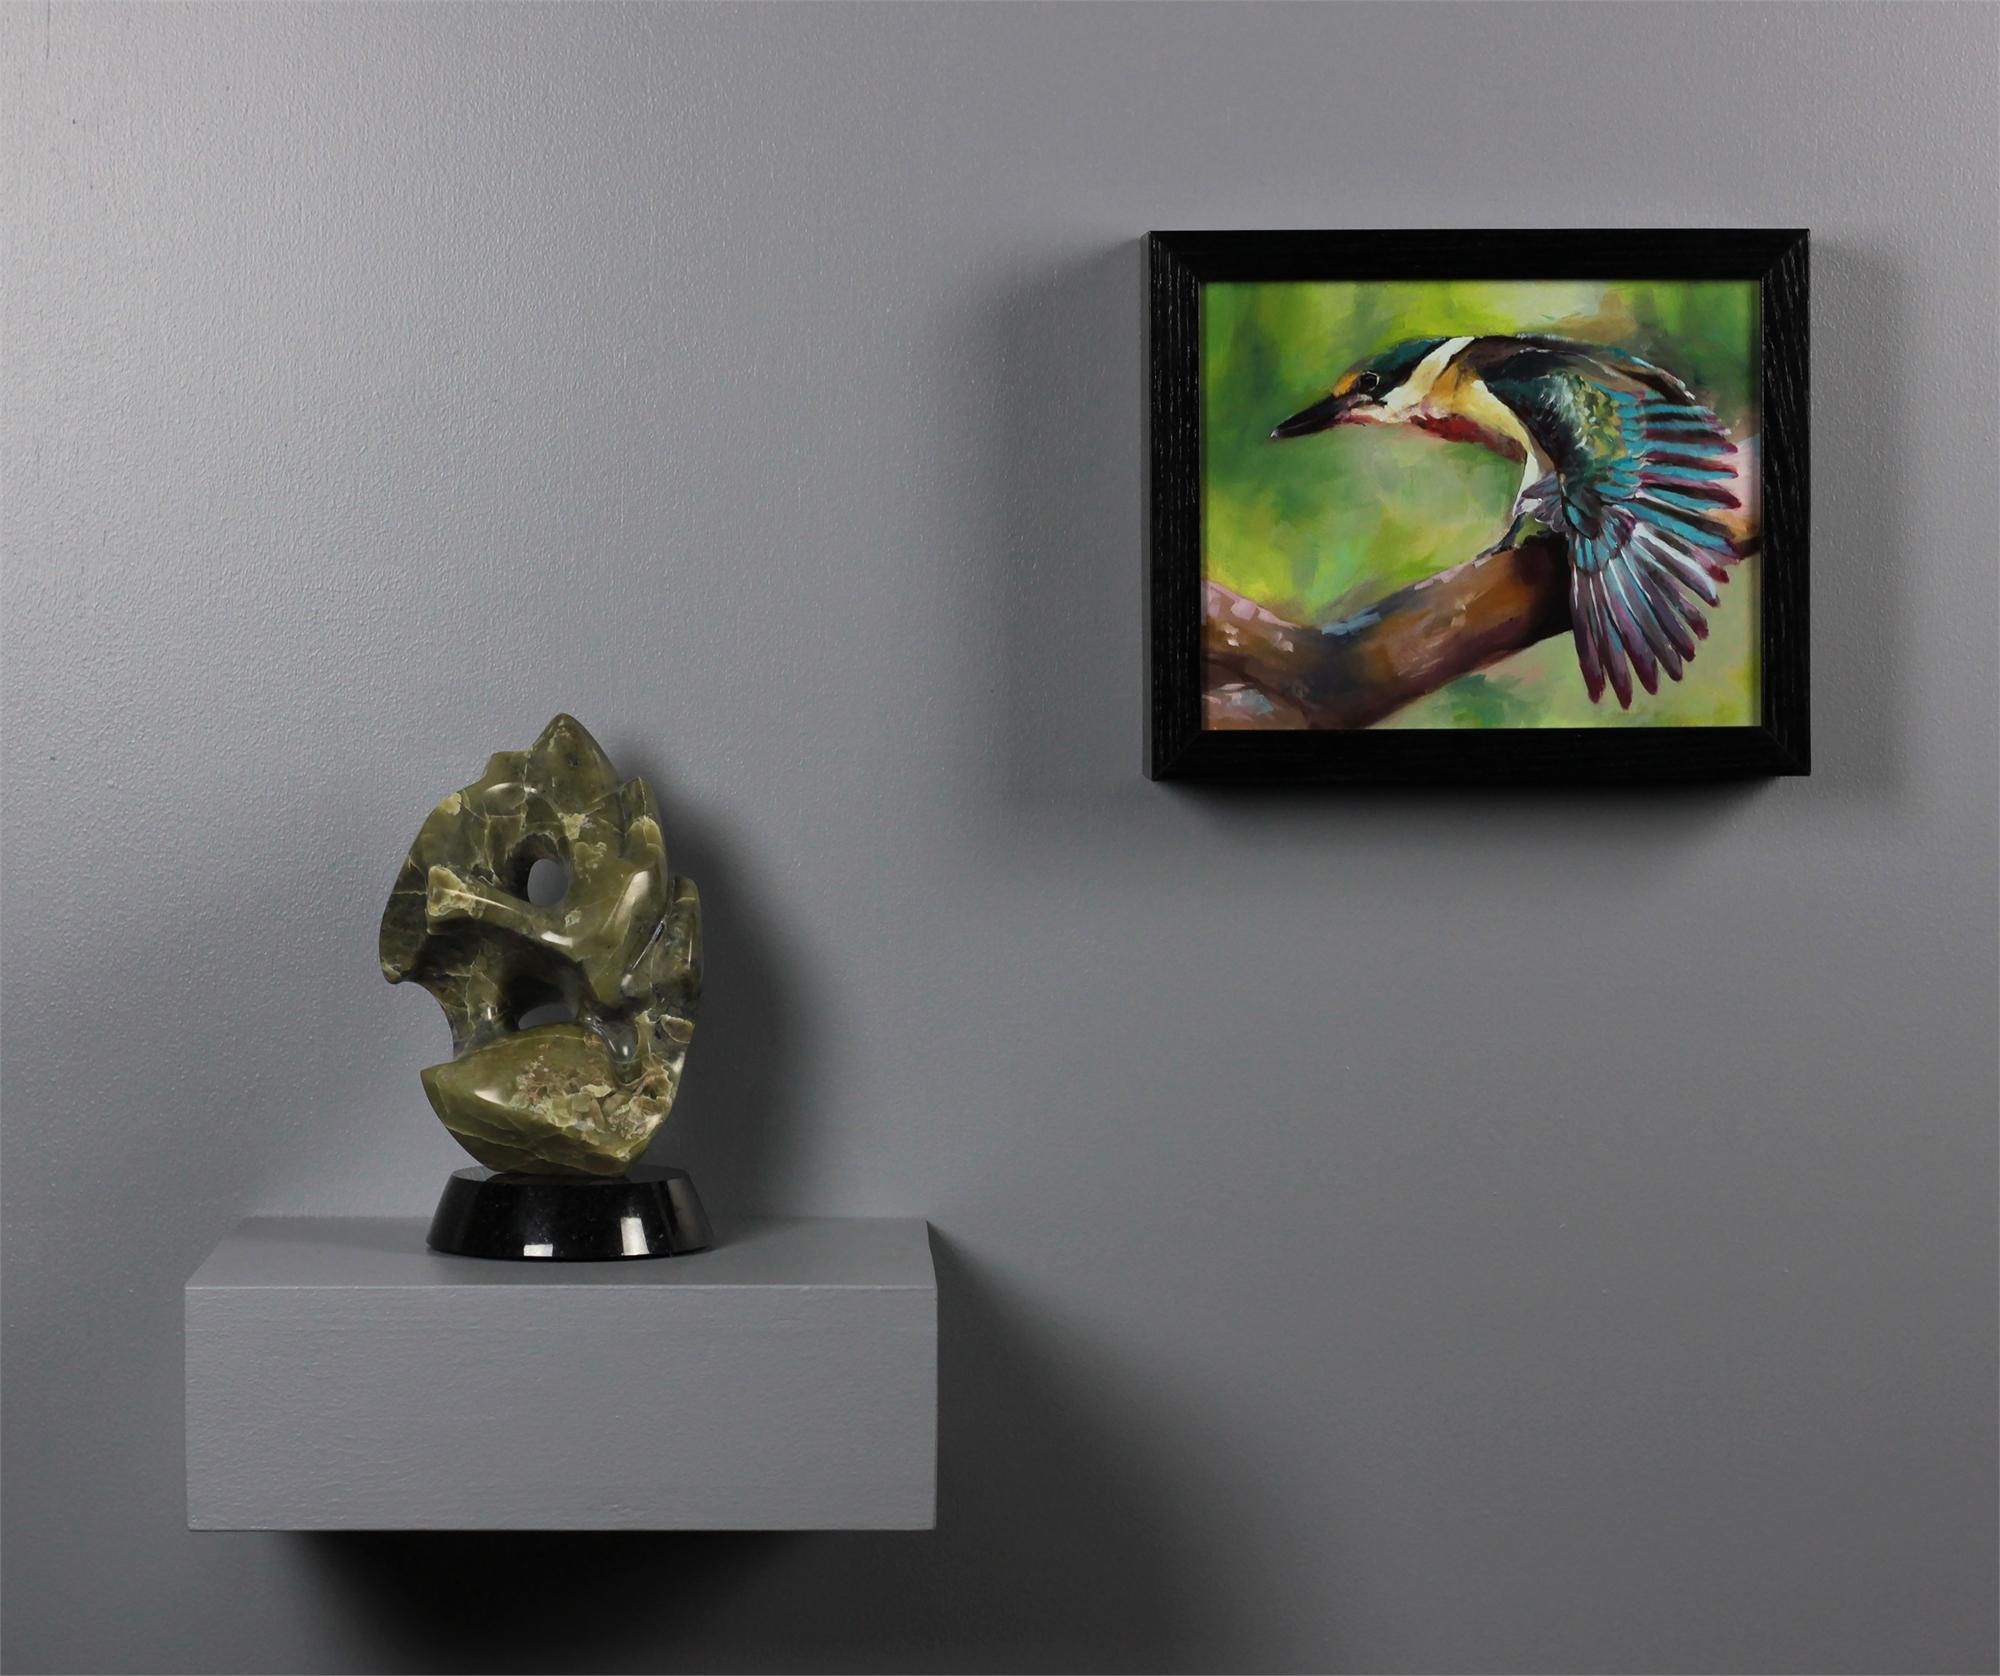 Birdstone by John McLeod